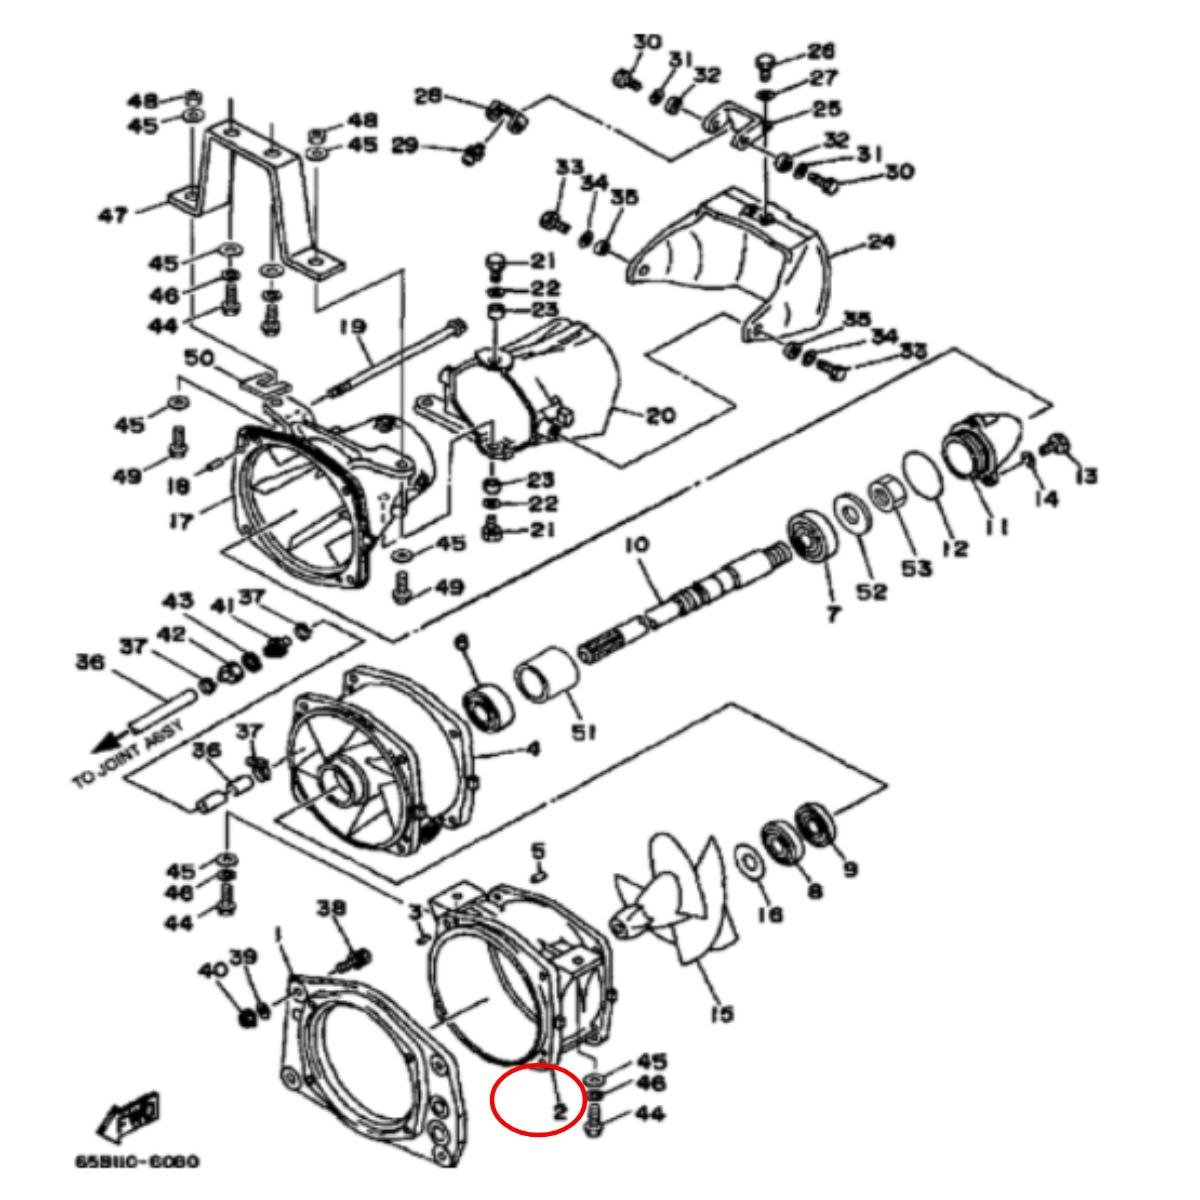 Cinta de Turbina para Jet Ski Yamaha 700/760/1100/1200  - Radical Peças - Peças para Jet Ski